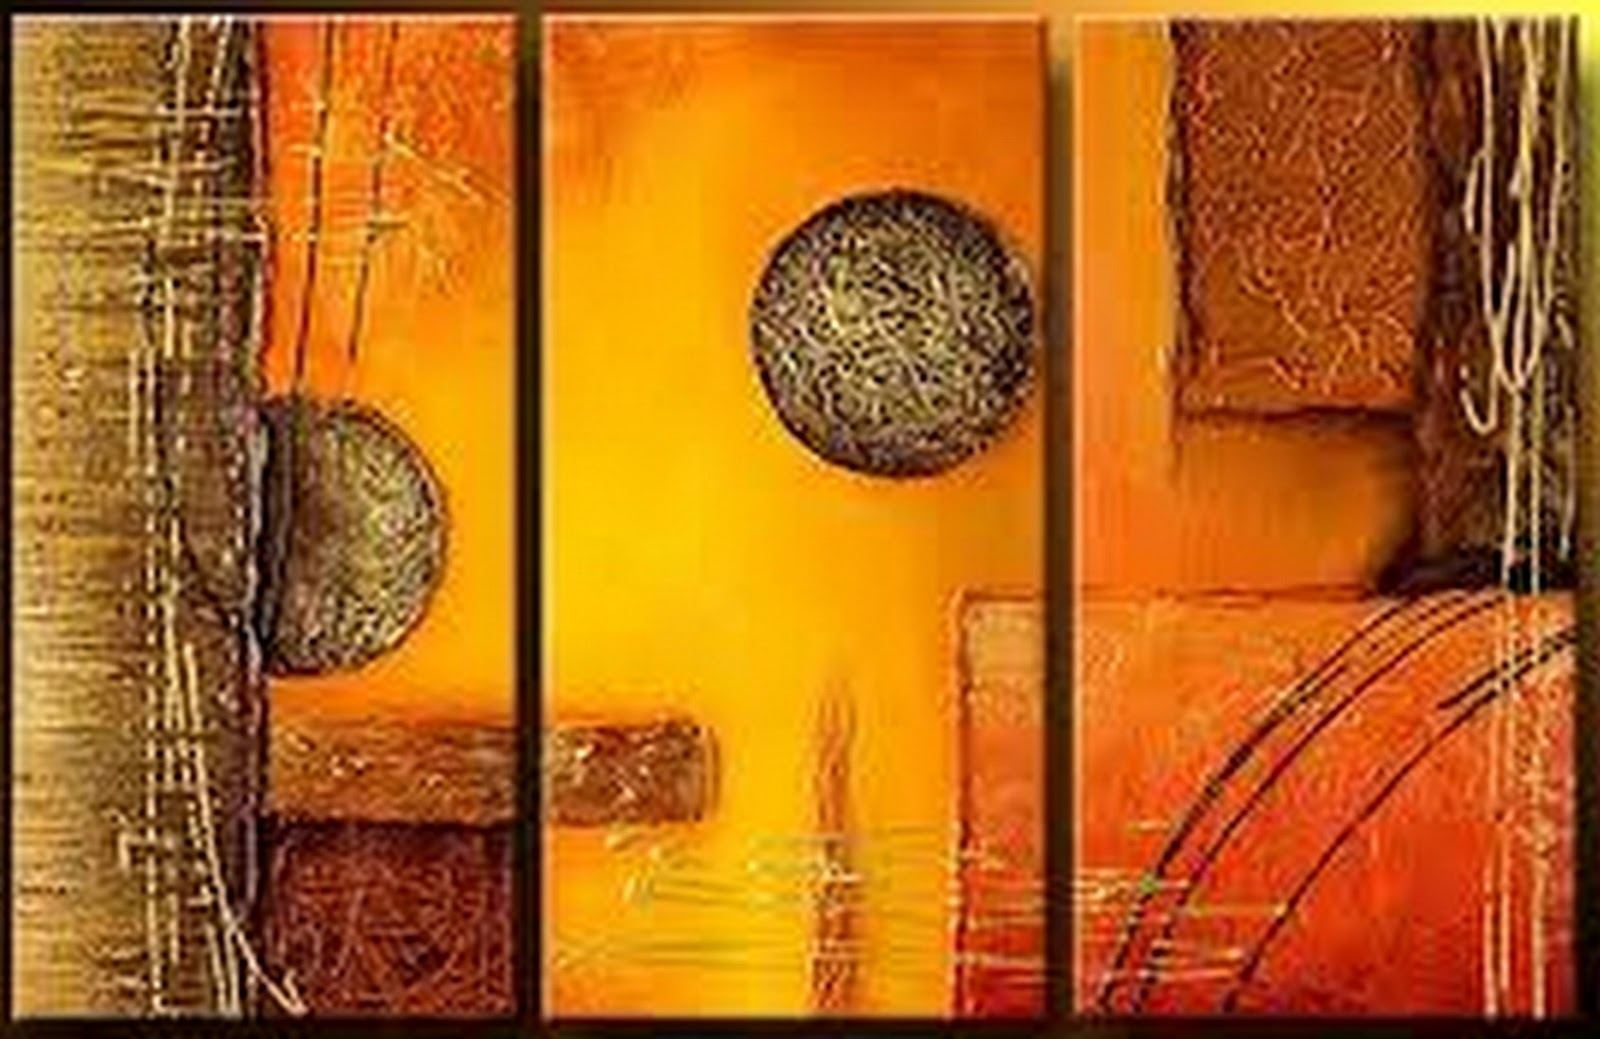 Pintura moderna y fotograf a art stica fotos de cuadros - Pinturas paredes modernas ...